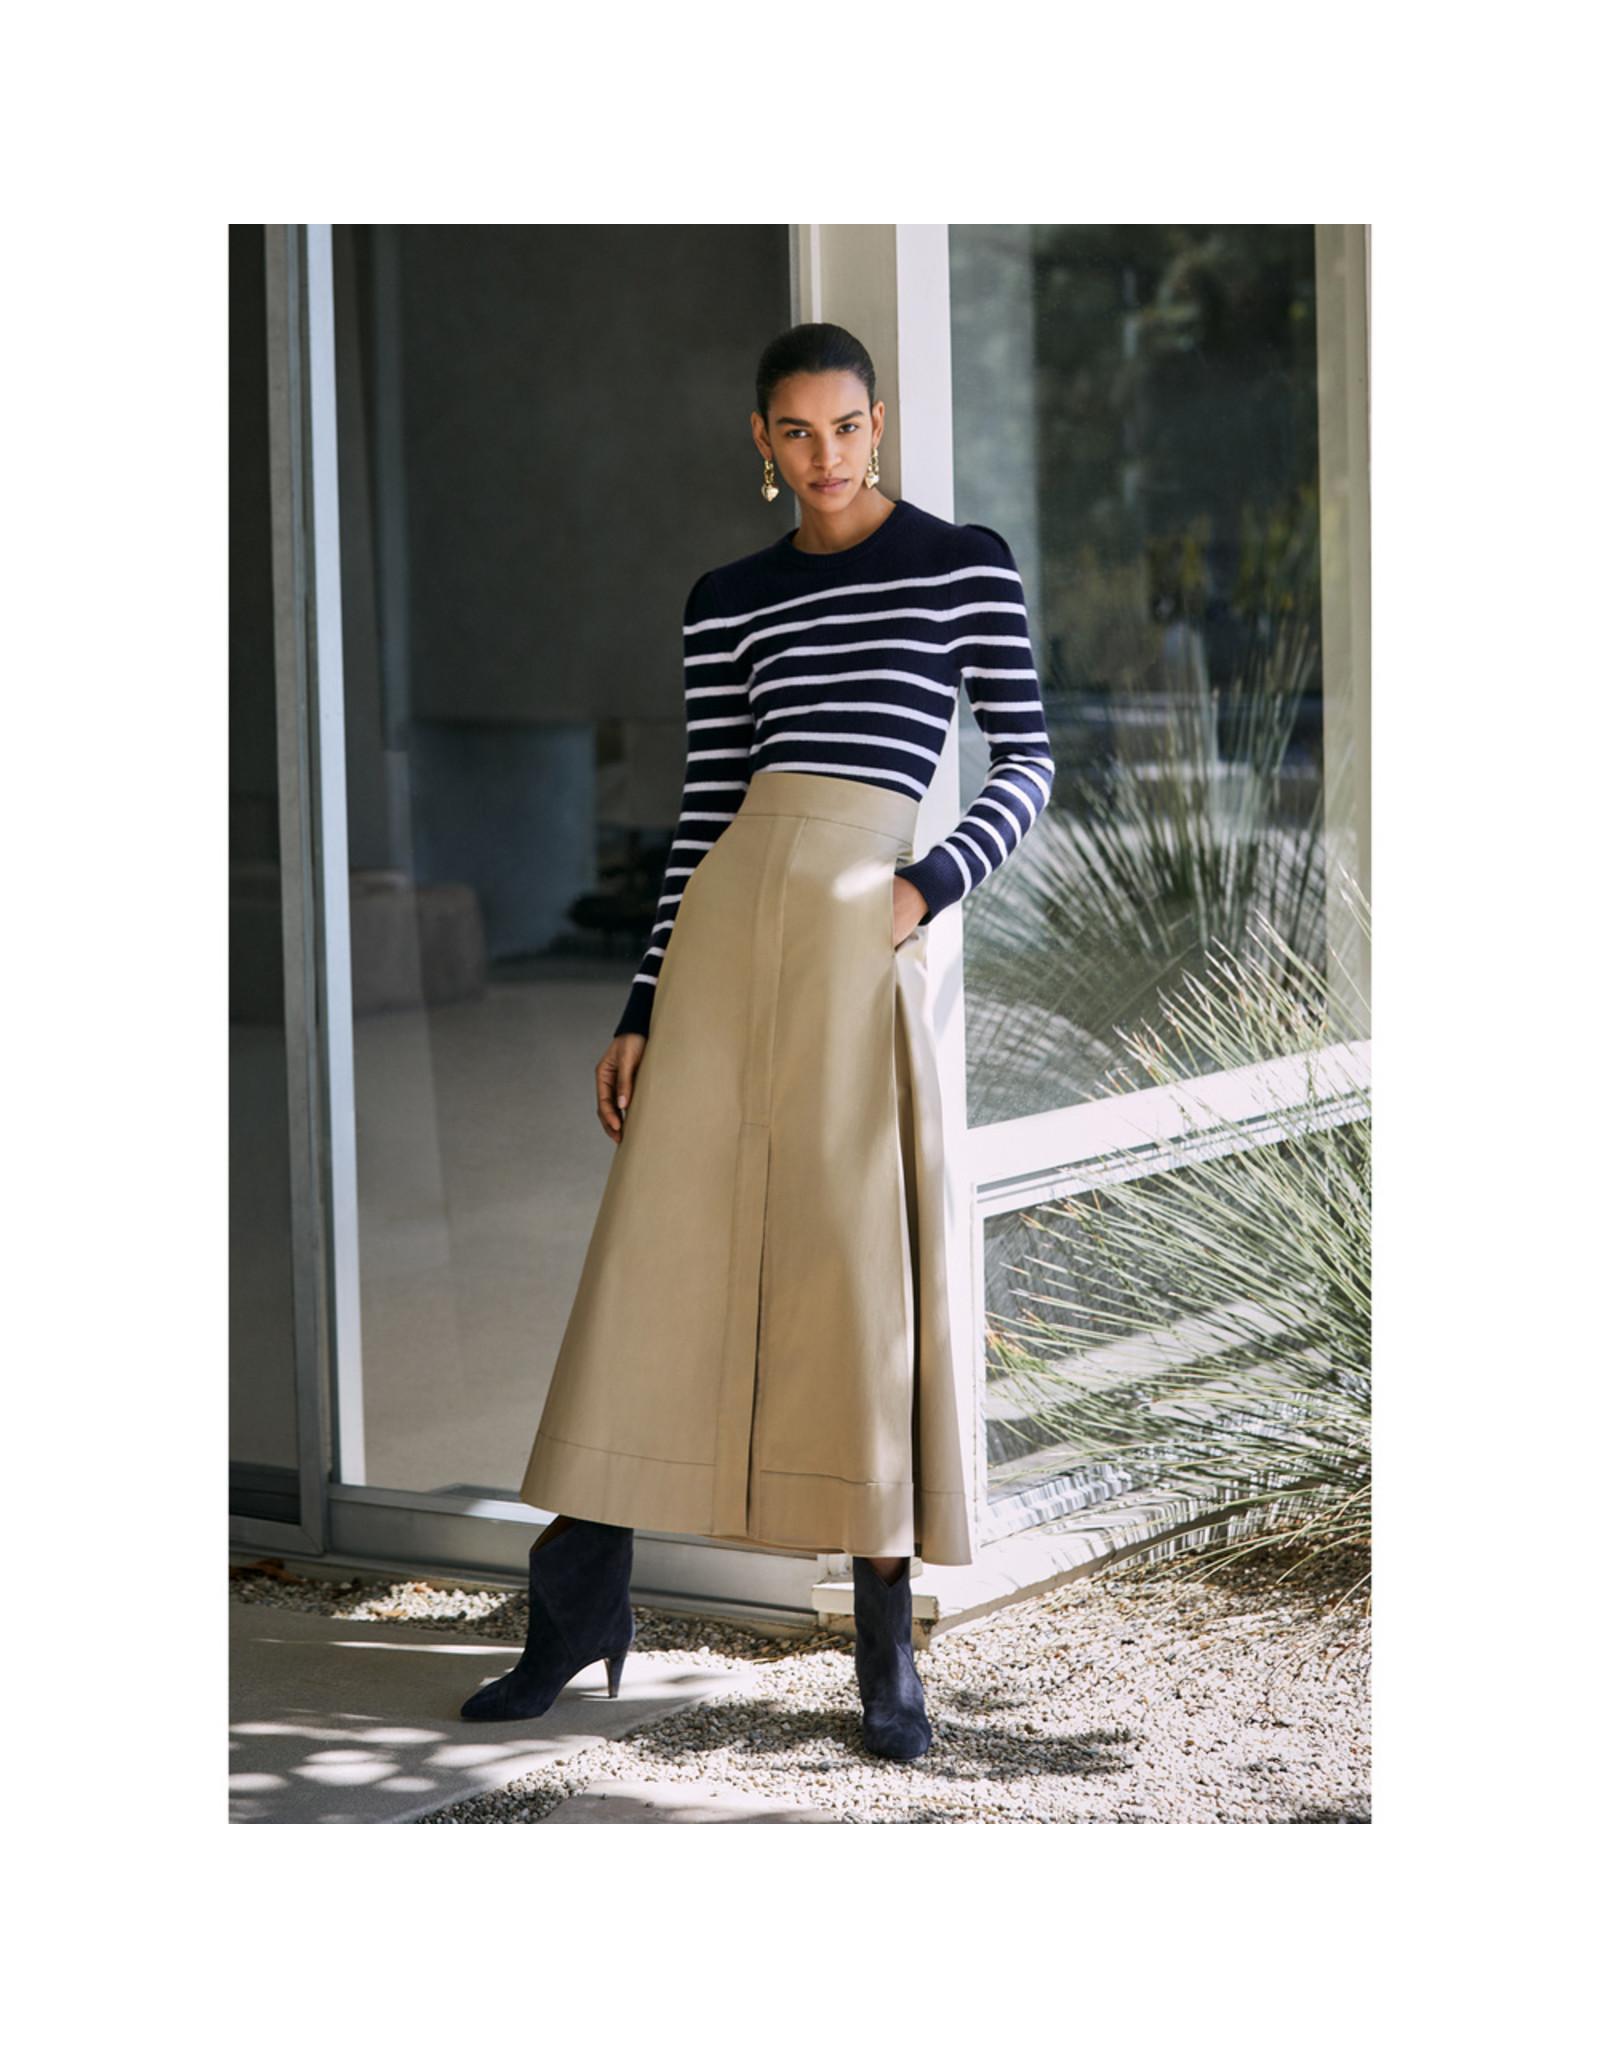 G. Label G. Label Diandra Maxi Skirt (Size: 6, Color: Khaki)